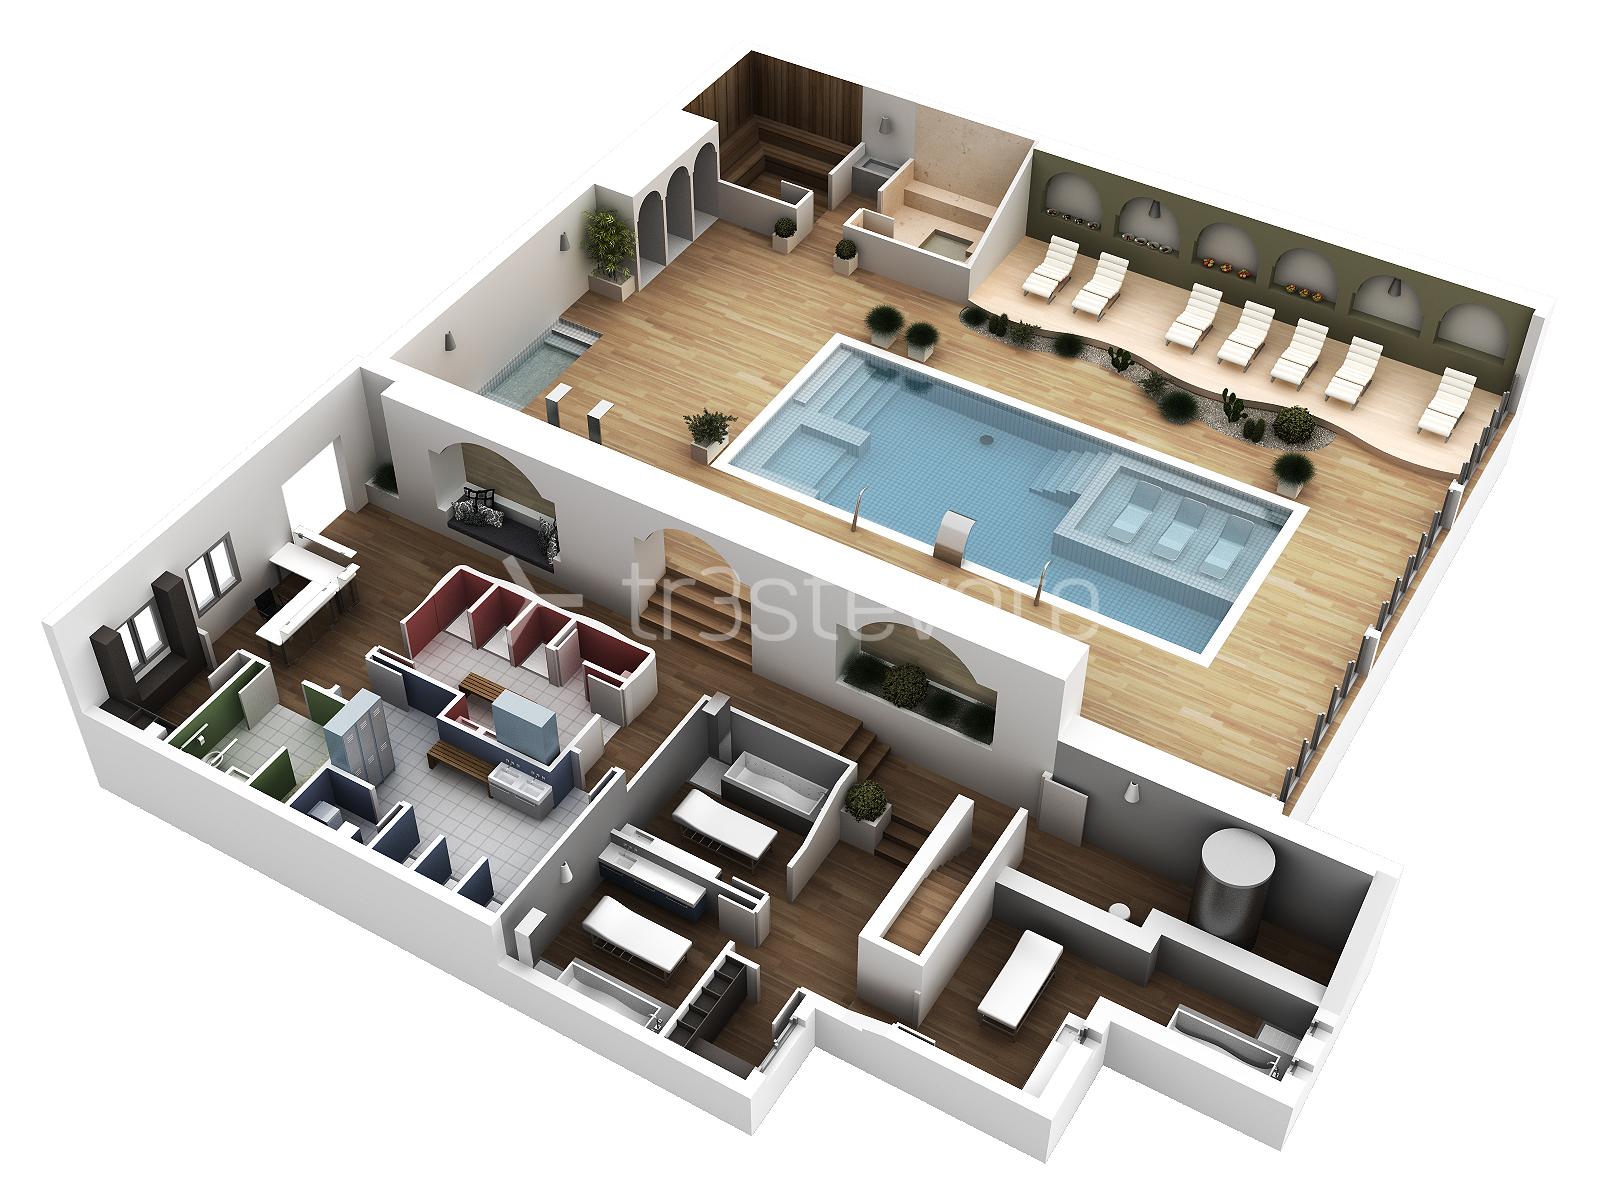 Planos arquitect nicos trest vere blog infografia 3d for Planos de cocina en 3d